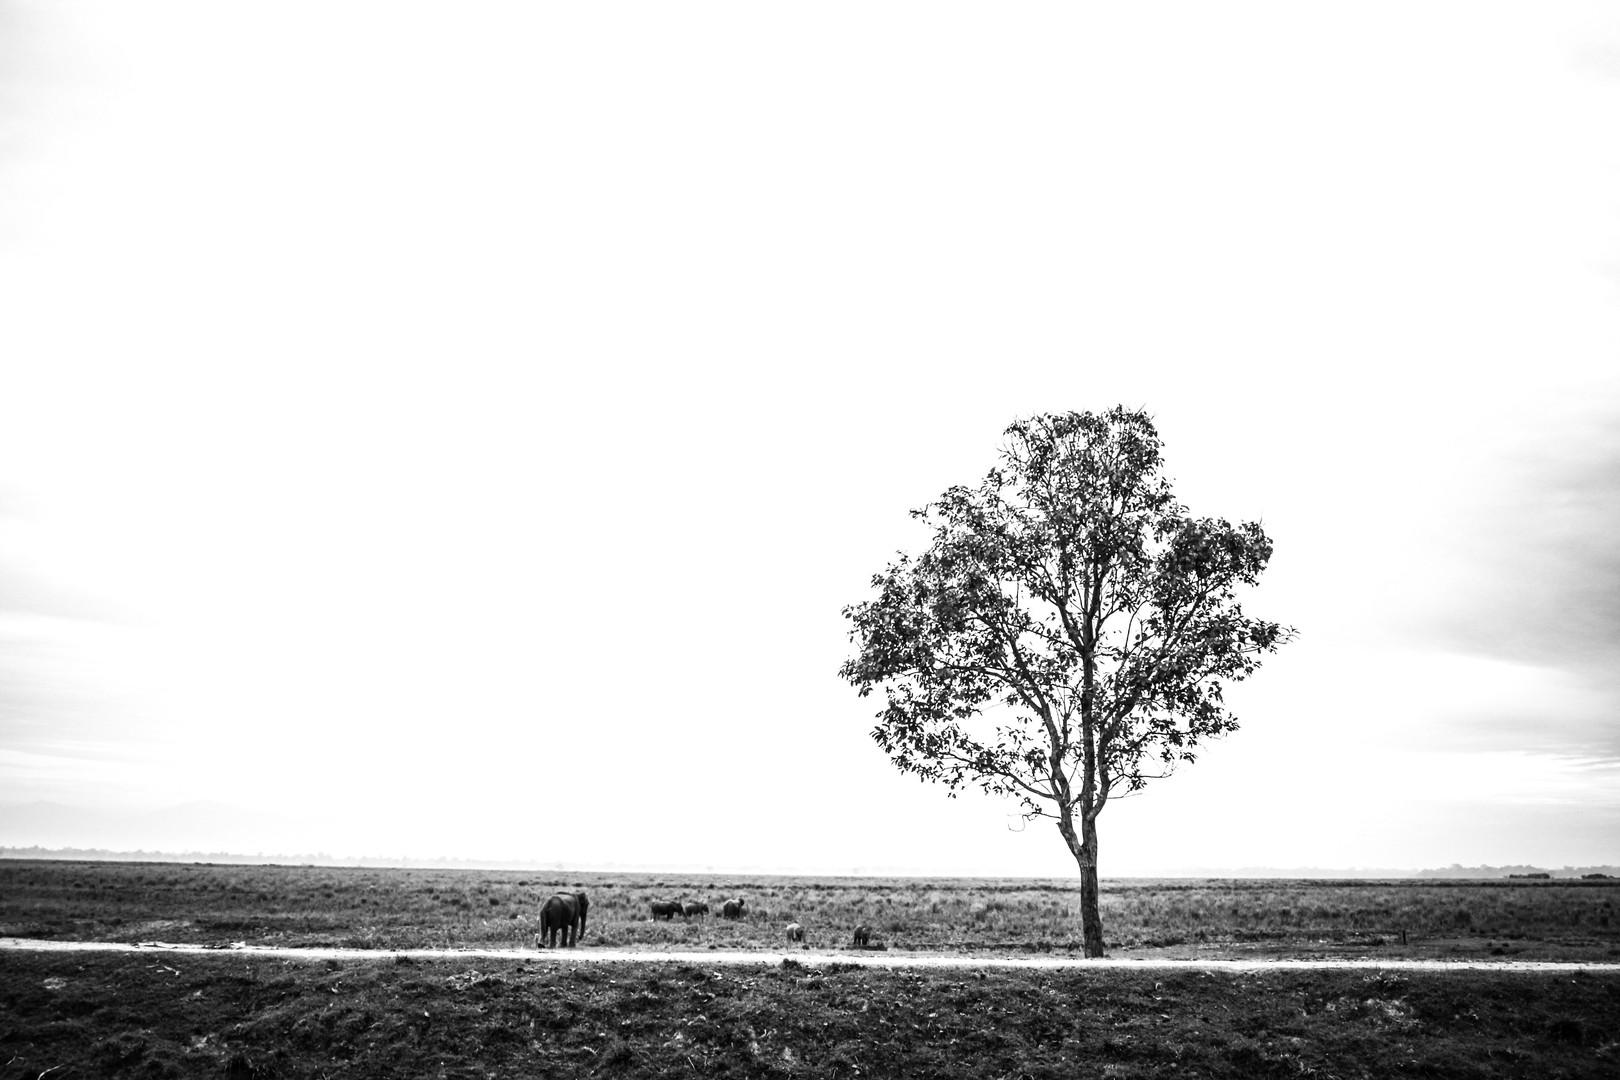 Plains | Assam, 2017